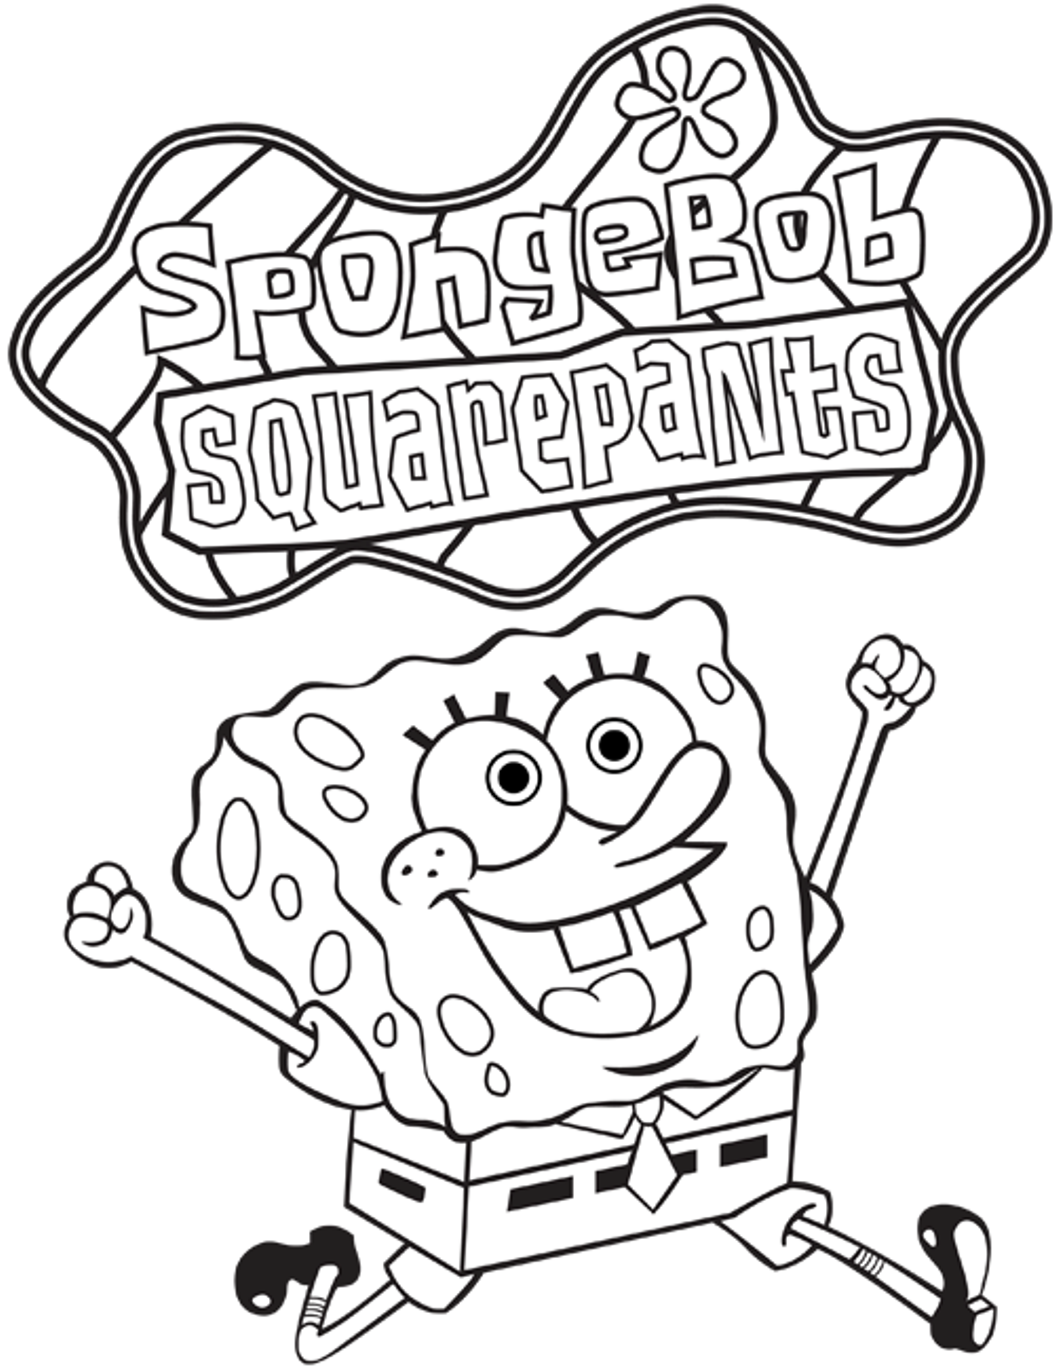 spongebob squarepants easter coloring pages - photo#10